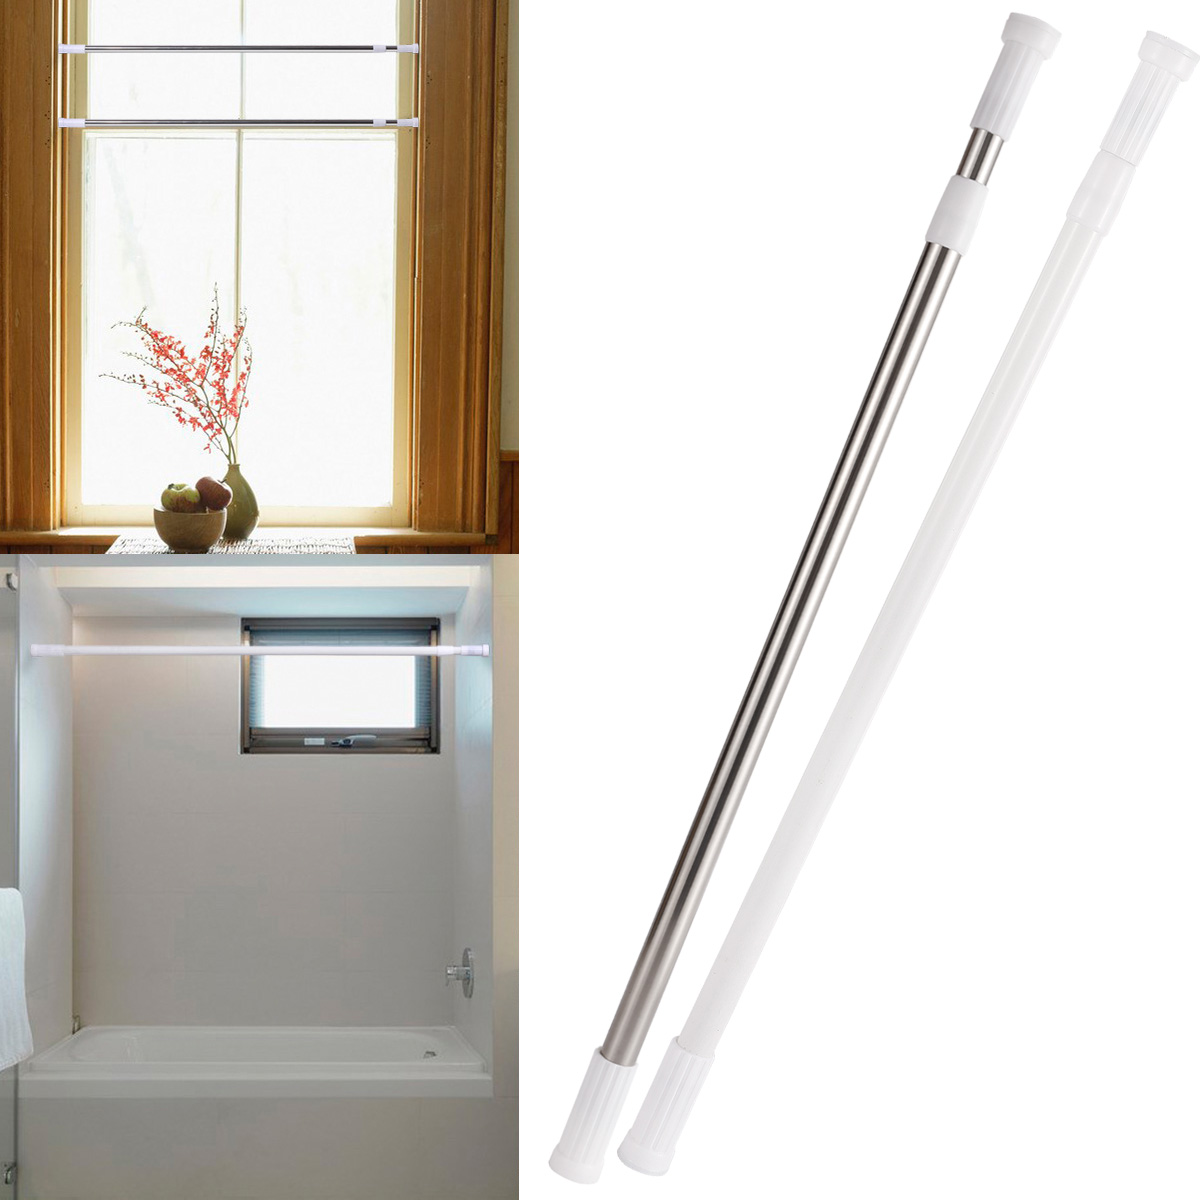 Barra recta universal para cortina ducha ba o extensible for Barra ducha extensible